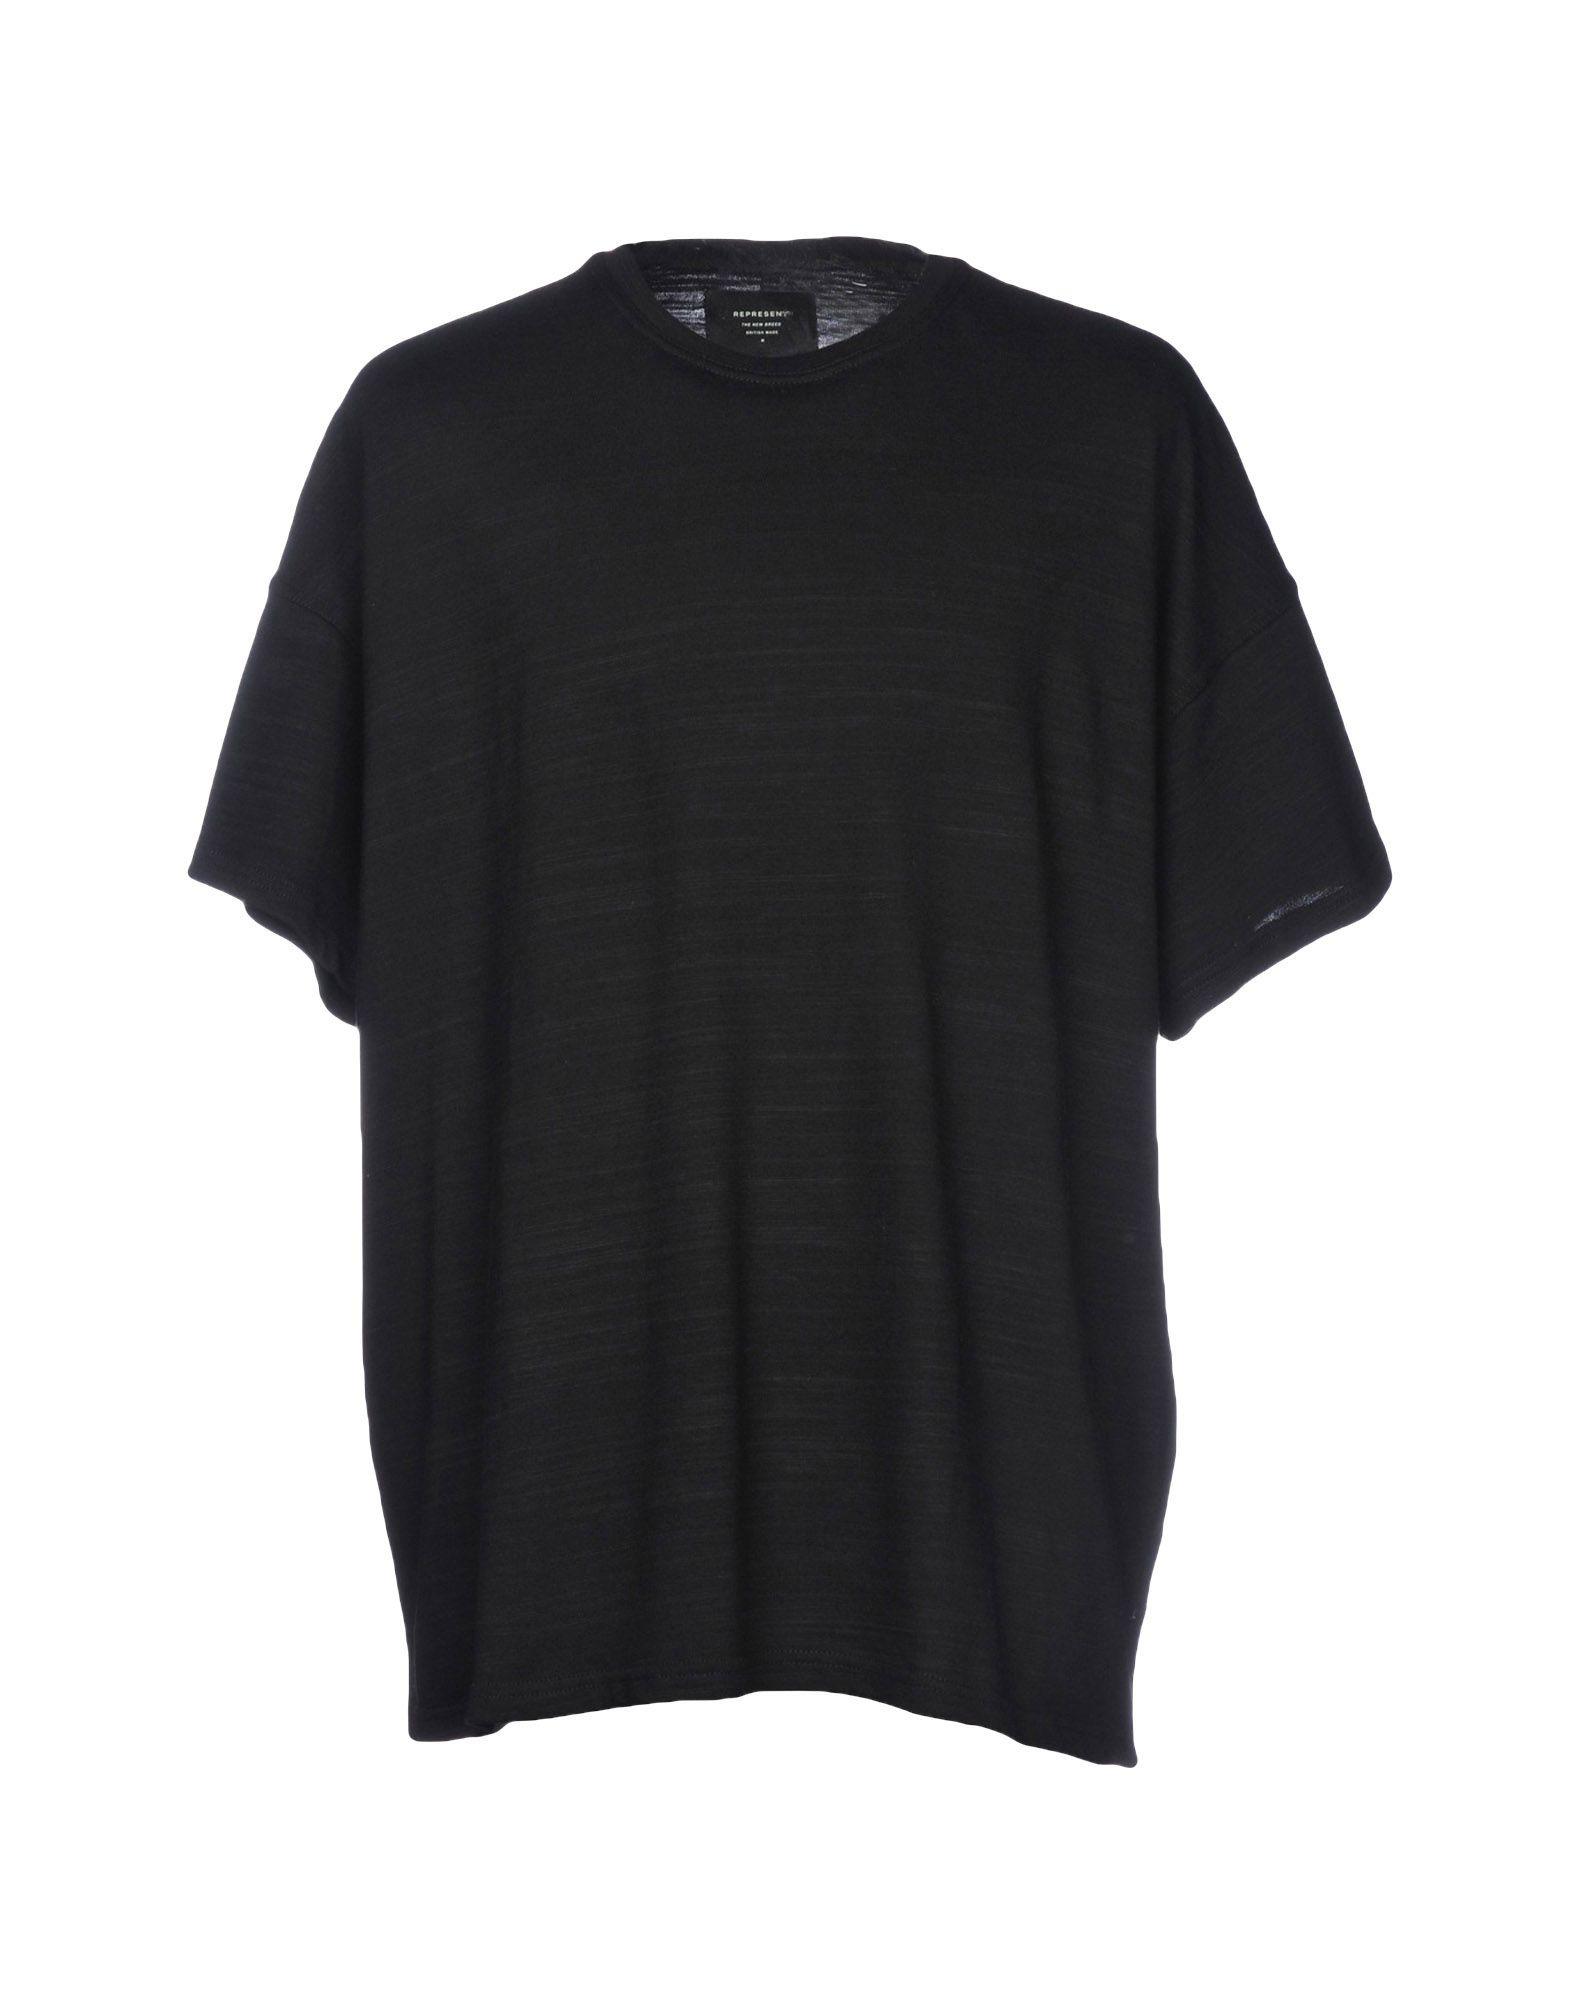 A buon mercato A buon mercato mercato buon T-Shirt Represent Uomo - 12188538WL bfdaf6